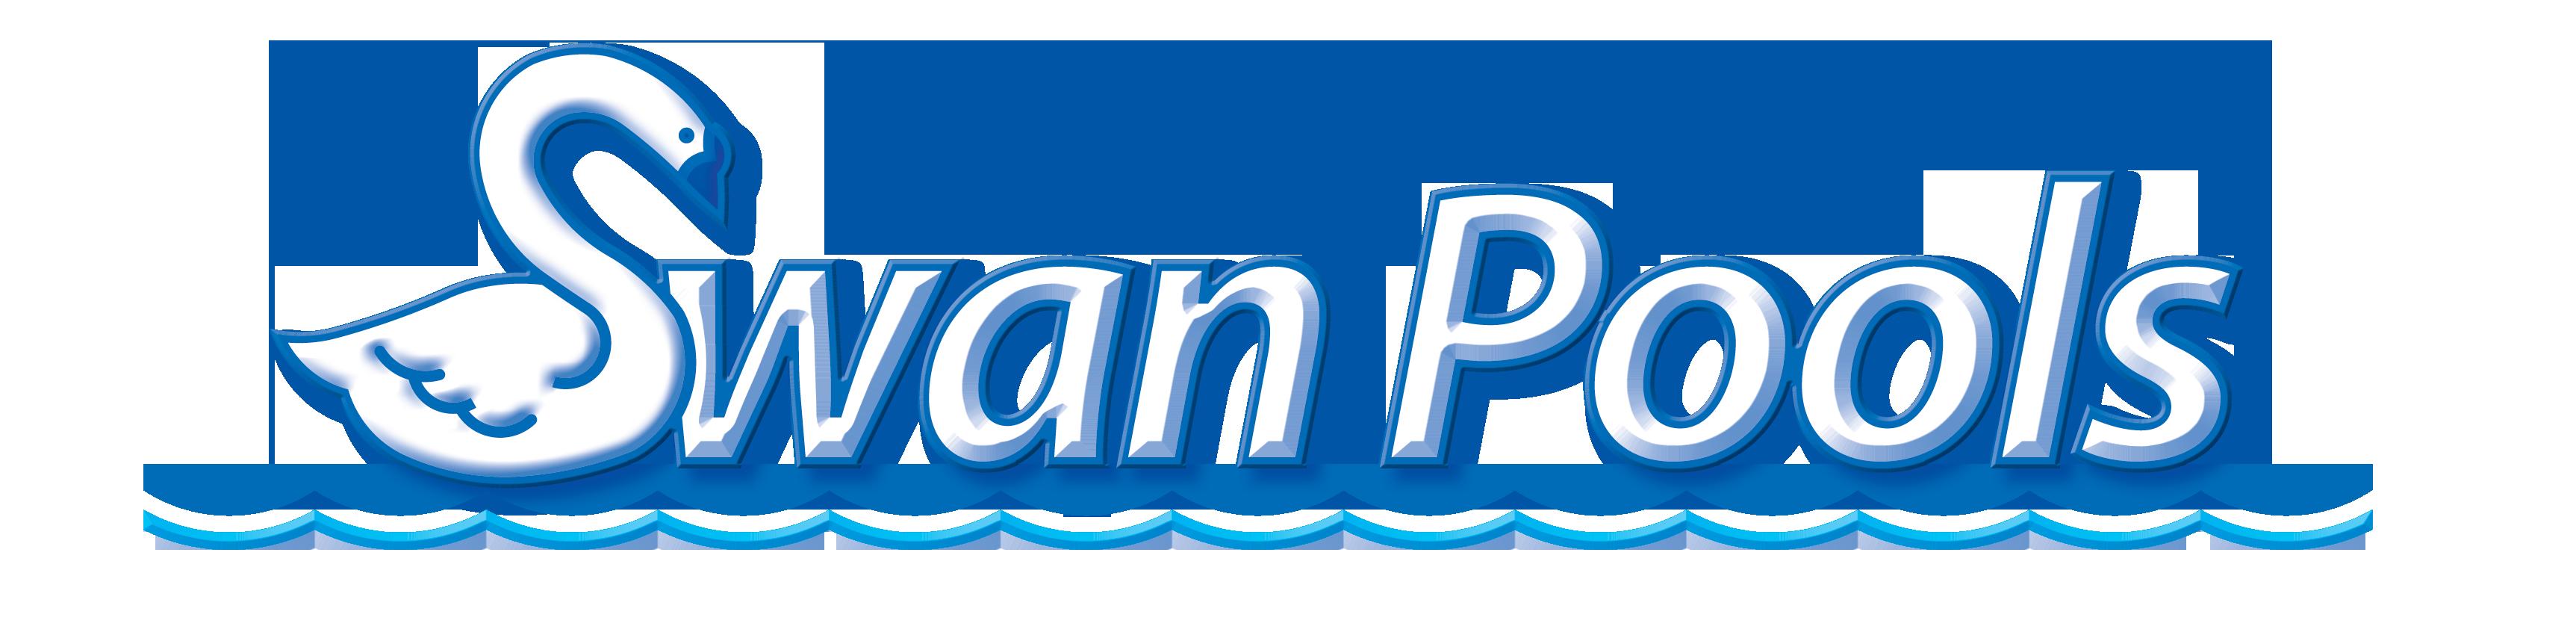 California Pool Builders Win Prestigious Award In Apsp